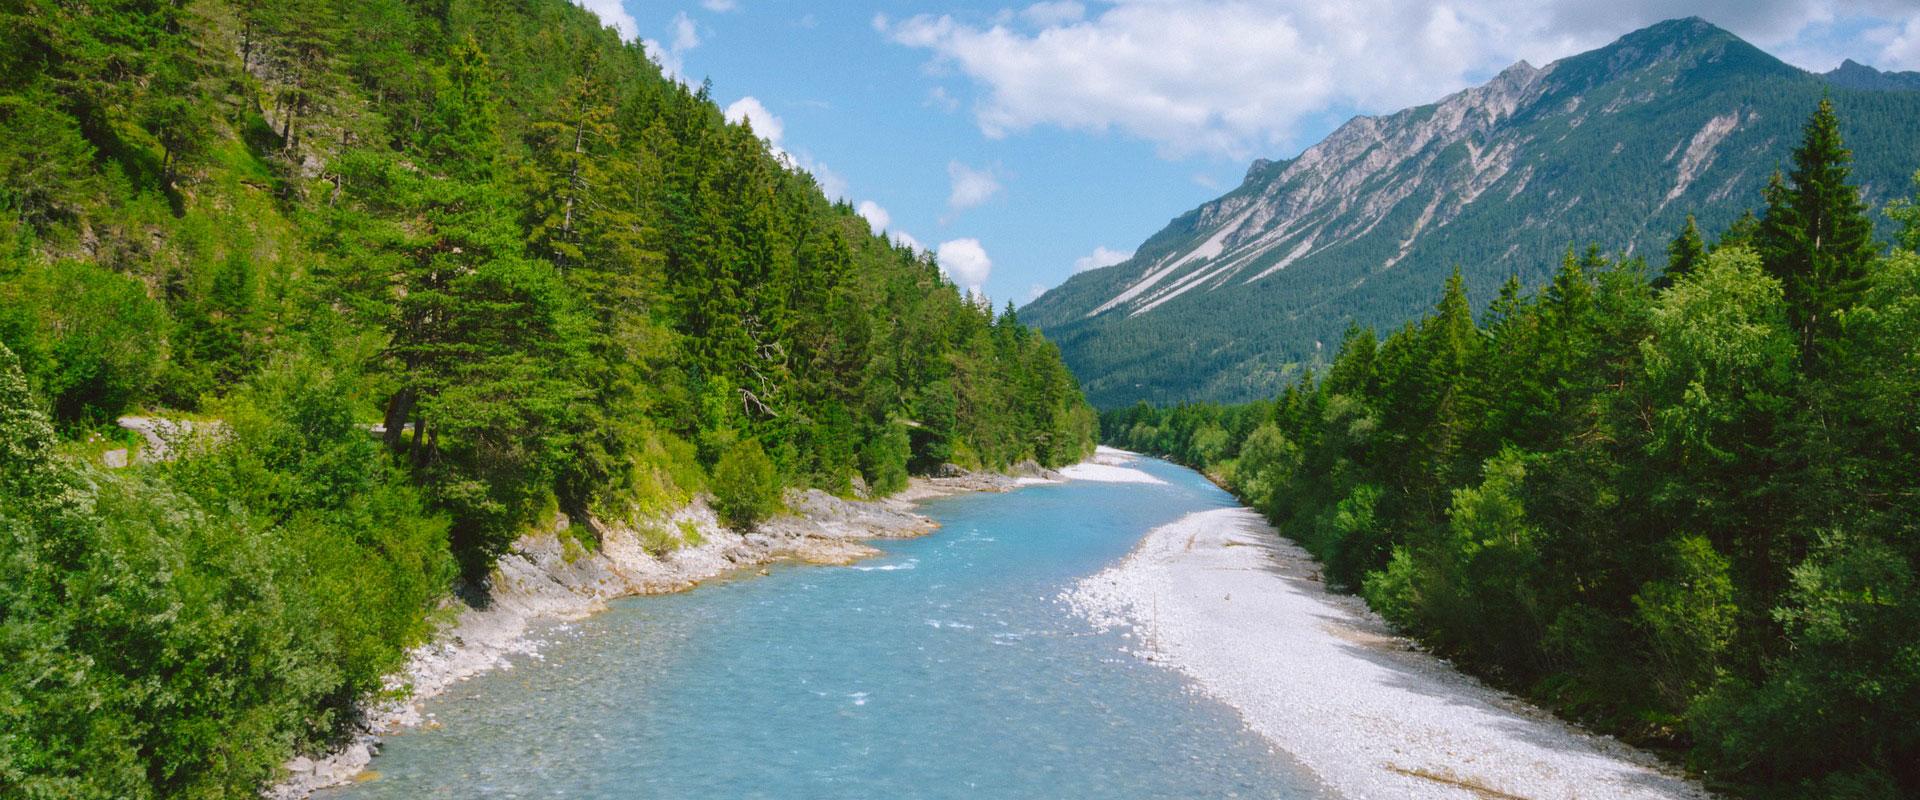 Alperne: Der Lechweg